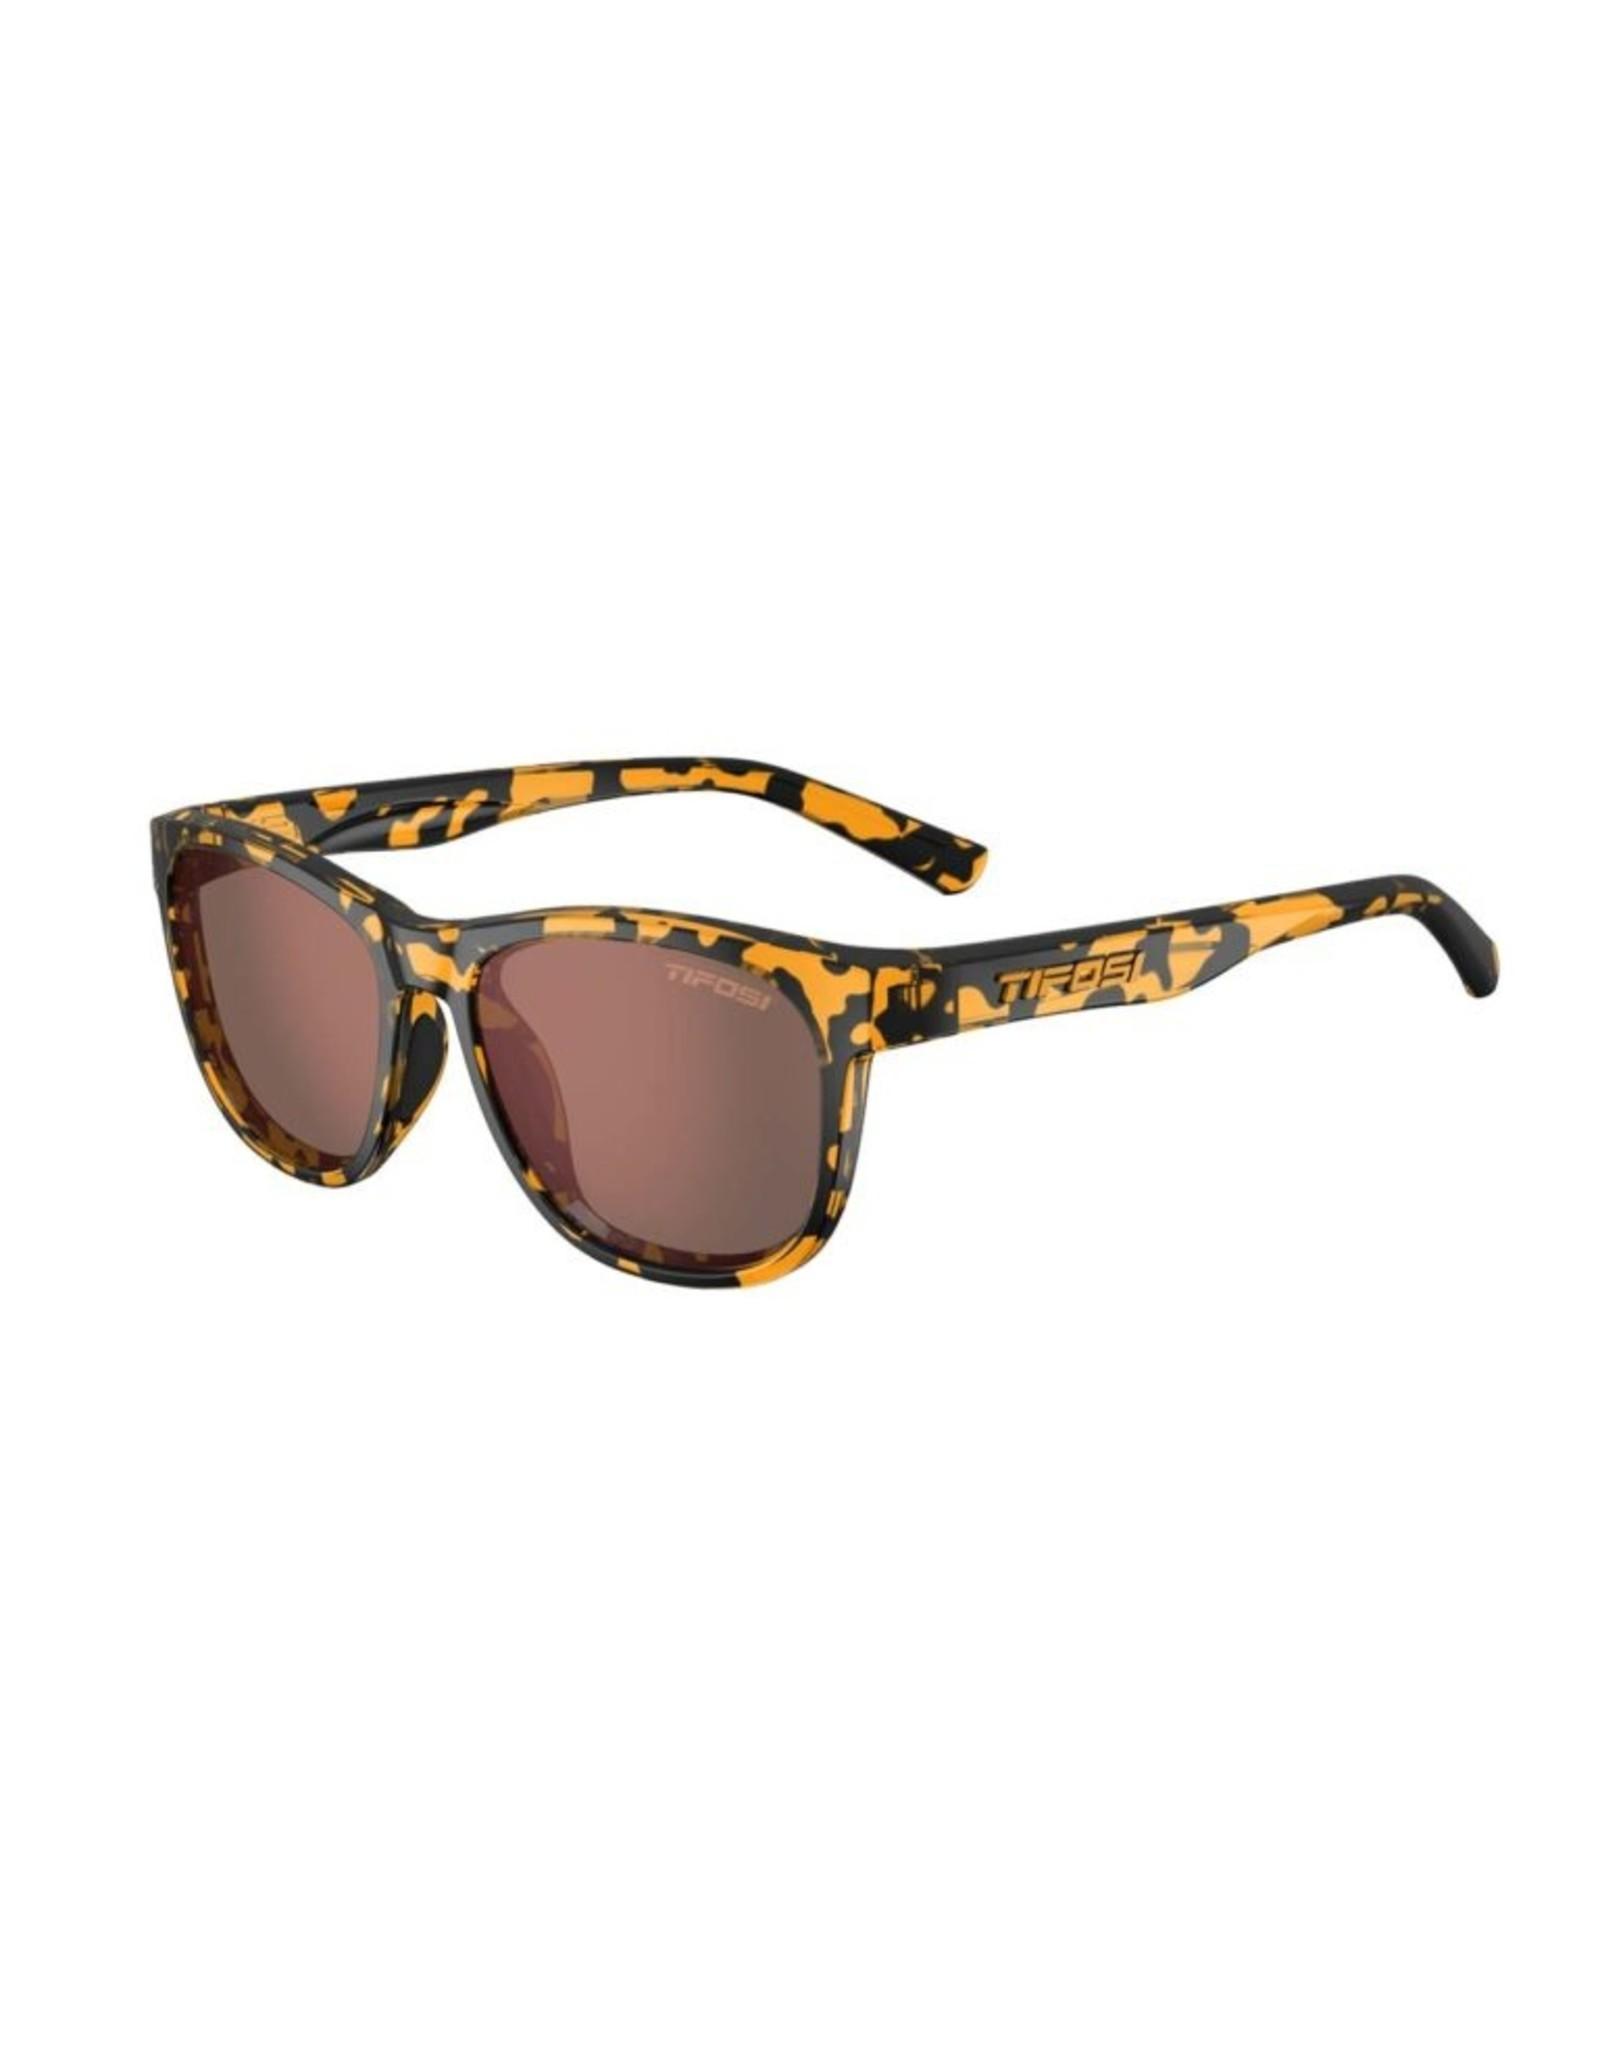 Tifosi Optics Swank, Yellow Confetti Polarized Sunglasses - Brown Polarized